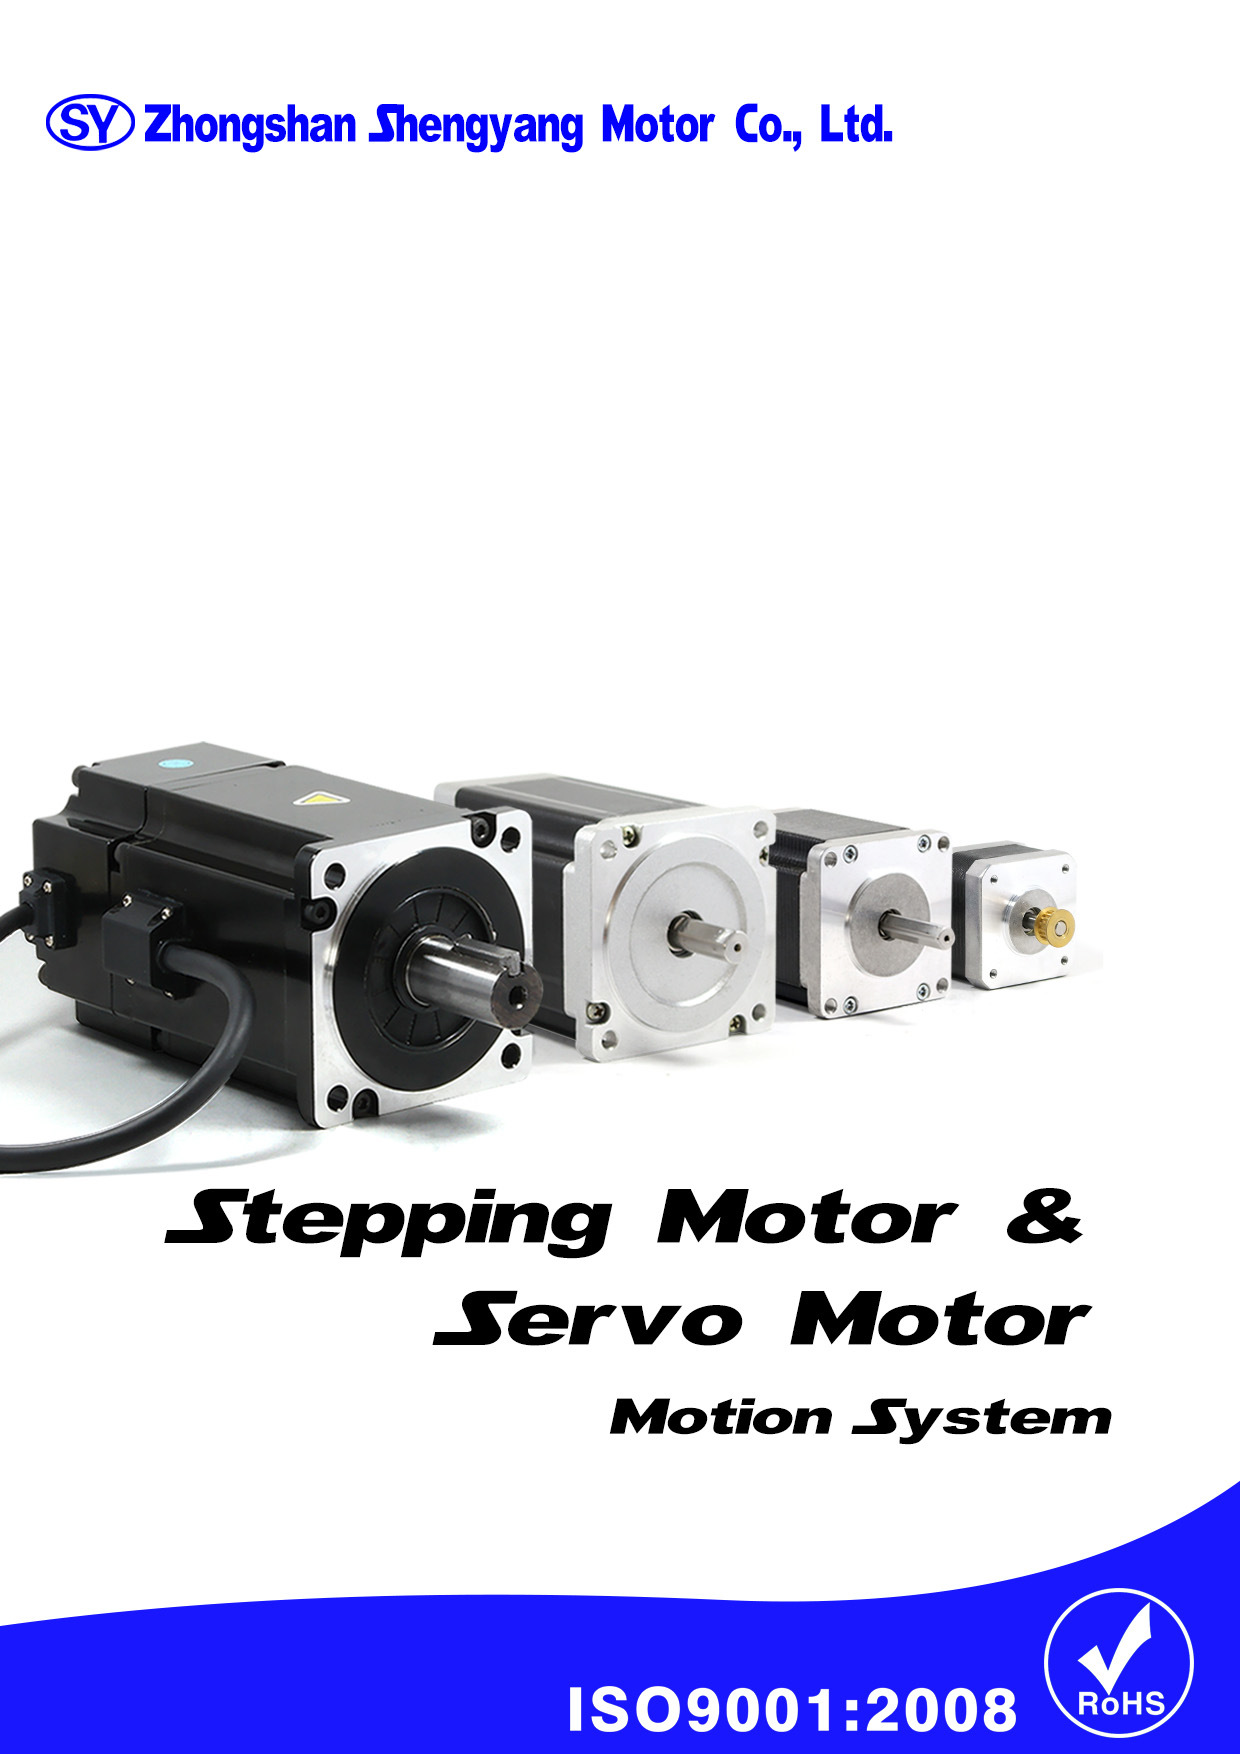 60mm Stepper Electrical Motor for 3D Printer, CNC Machine